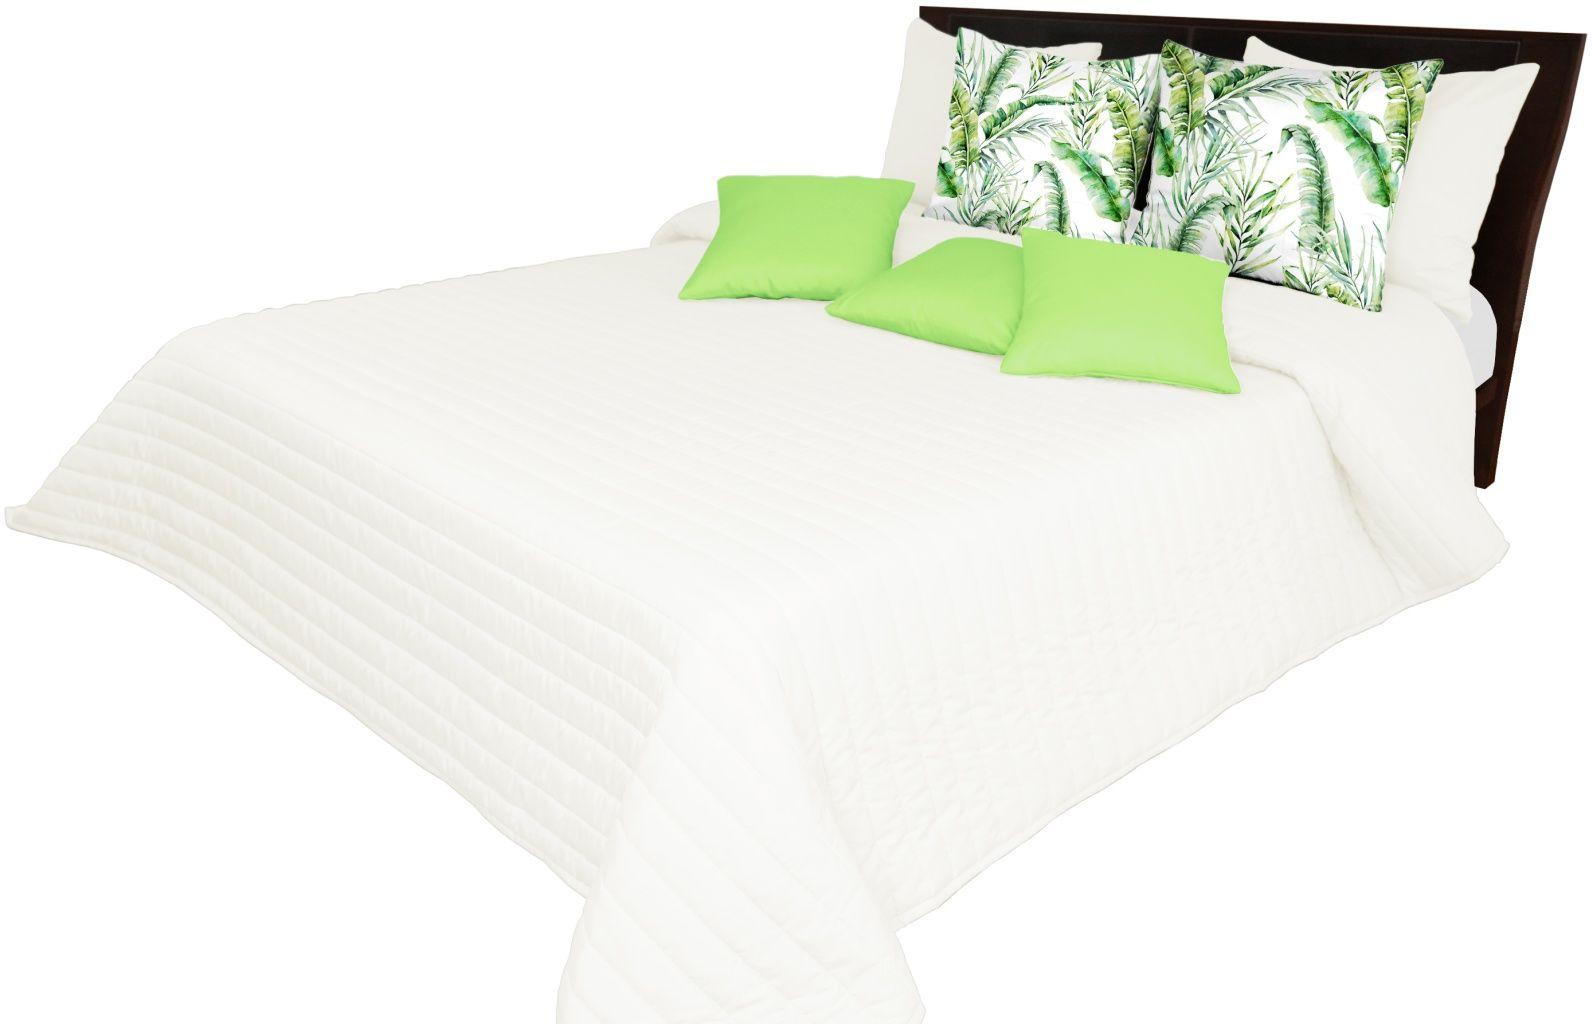 Narzuta pikowana na łóżko NMG-05 Mariall